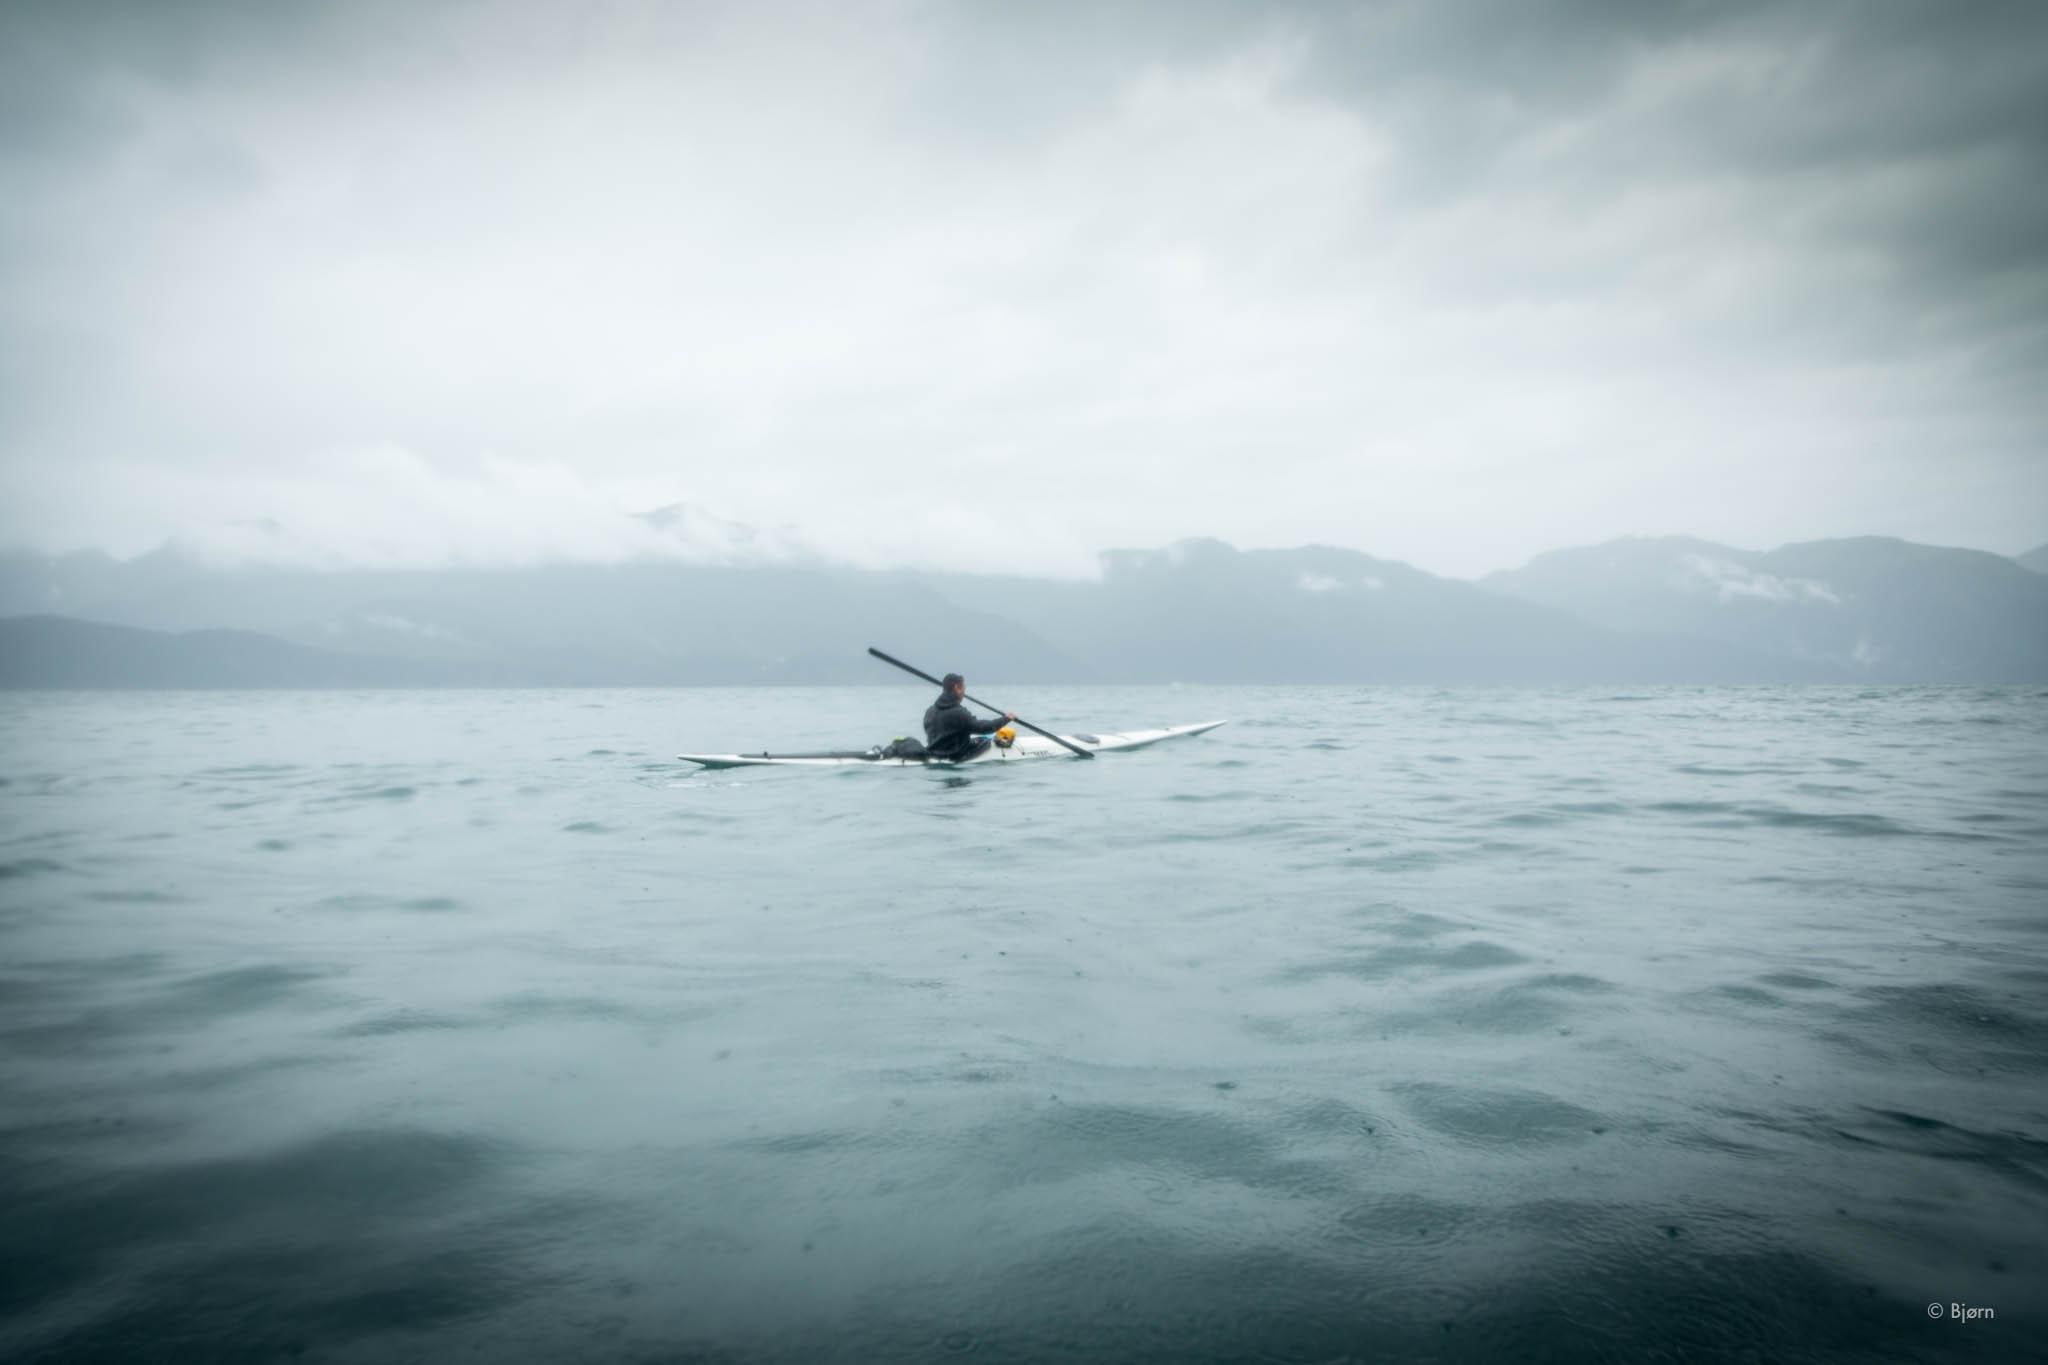 Maligiaq returns to Seward - Resurrection Bay, Alaska.